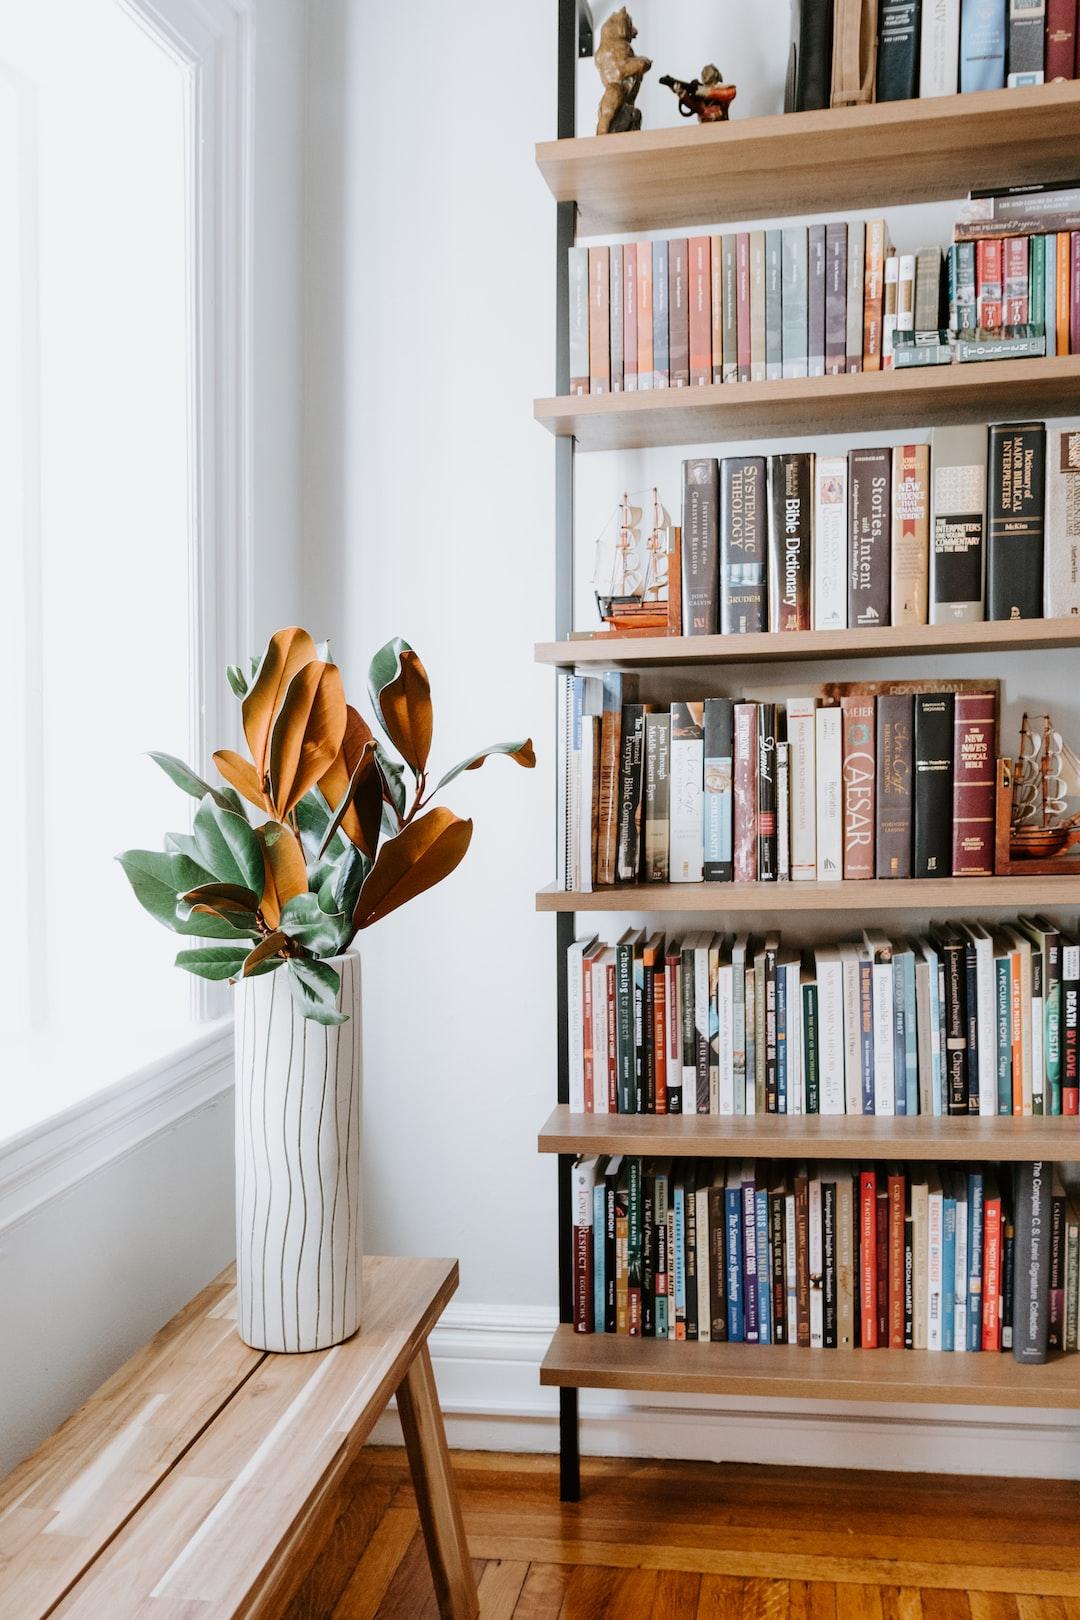 Cara Merawat Buku Agar Tetap Sempurna dan Tidak Rusak